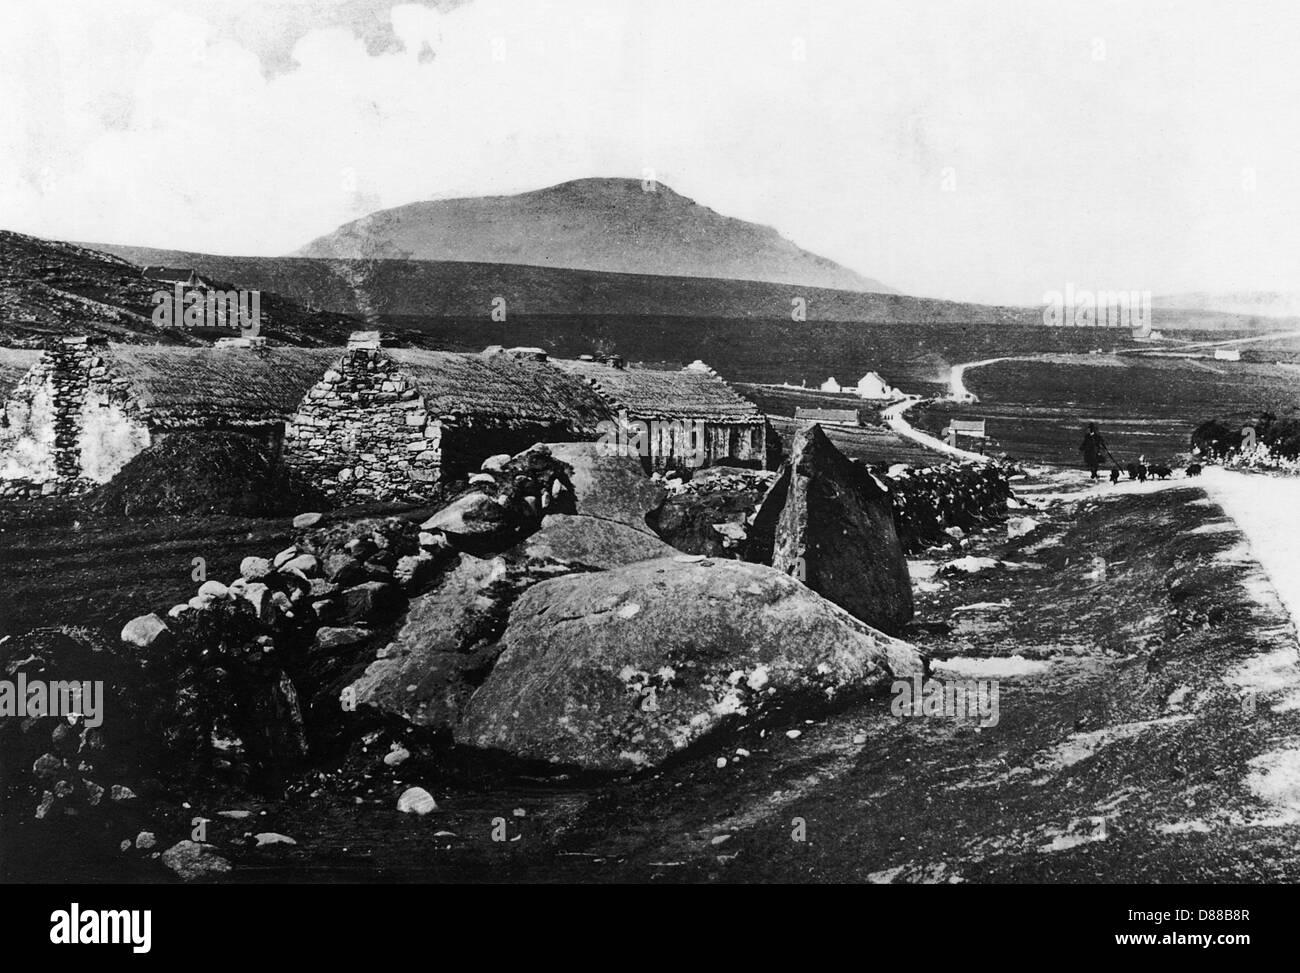 Achill Island Ireland - Stock Image